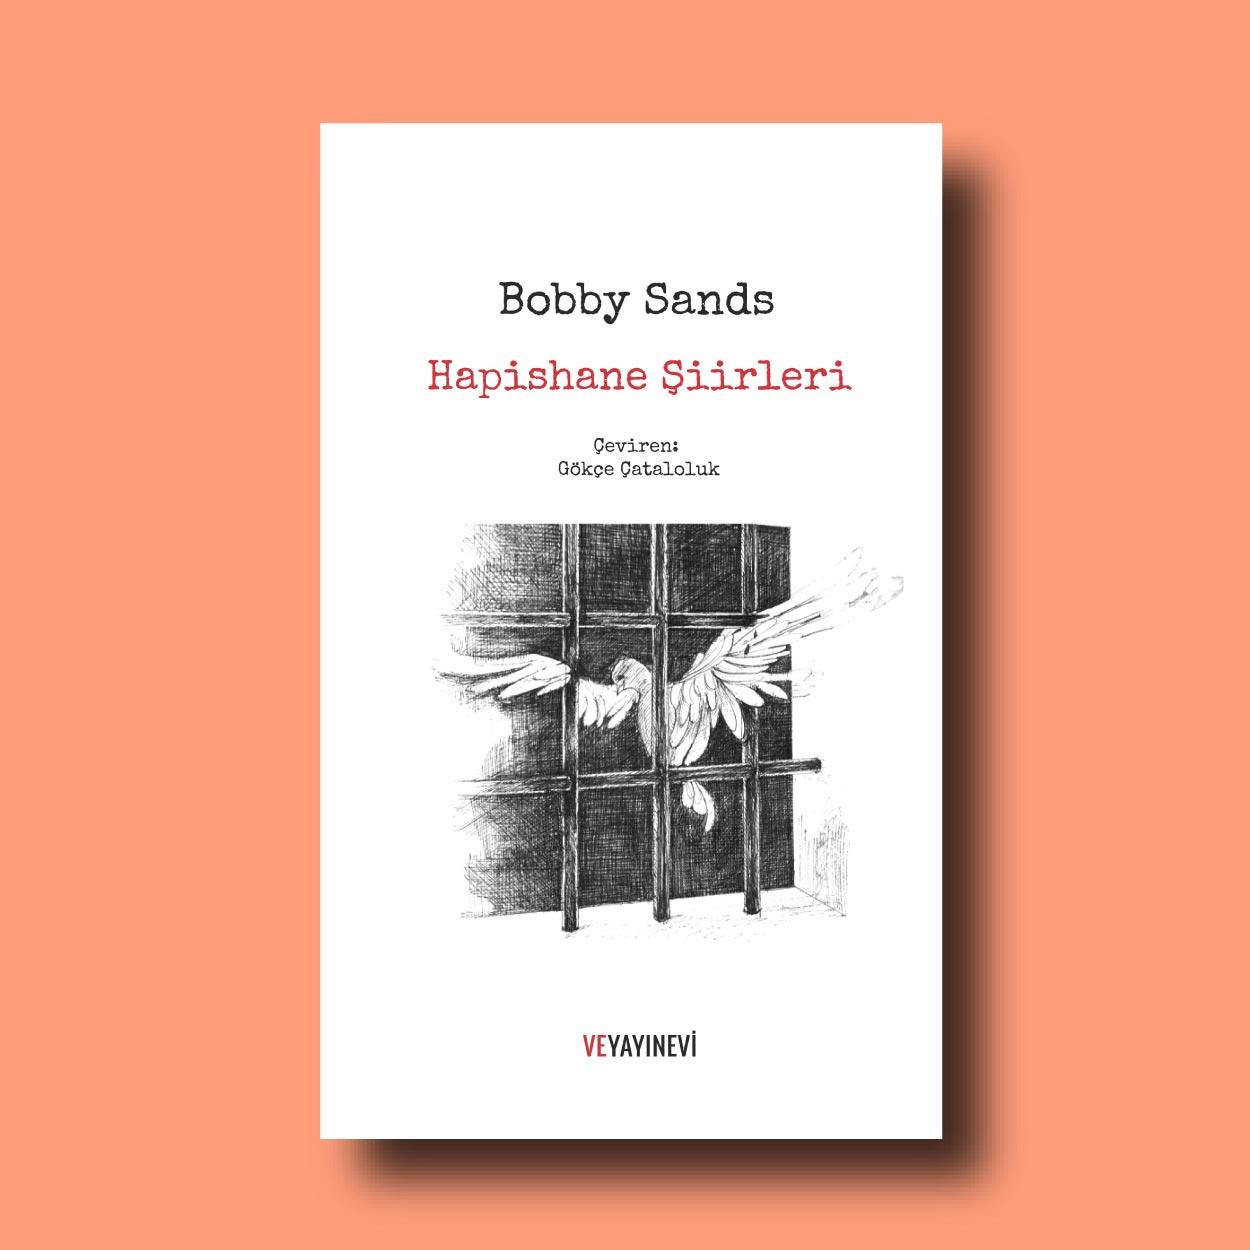 Hapishane Şiirleri, Bobby Sands